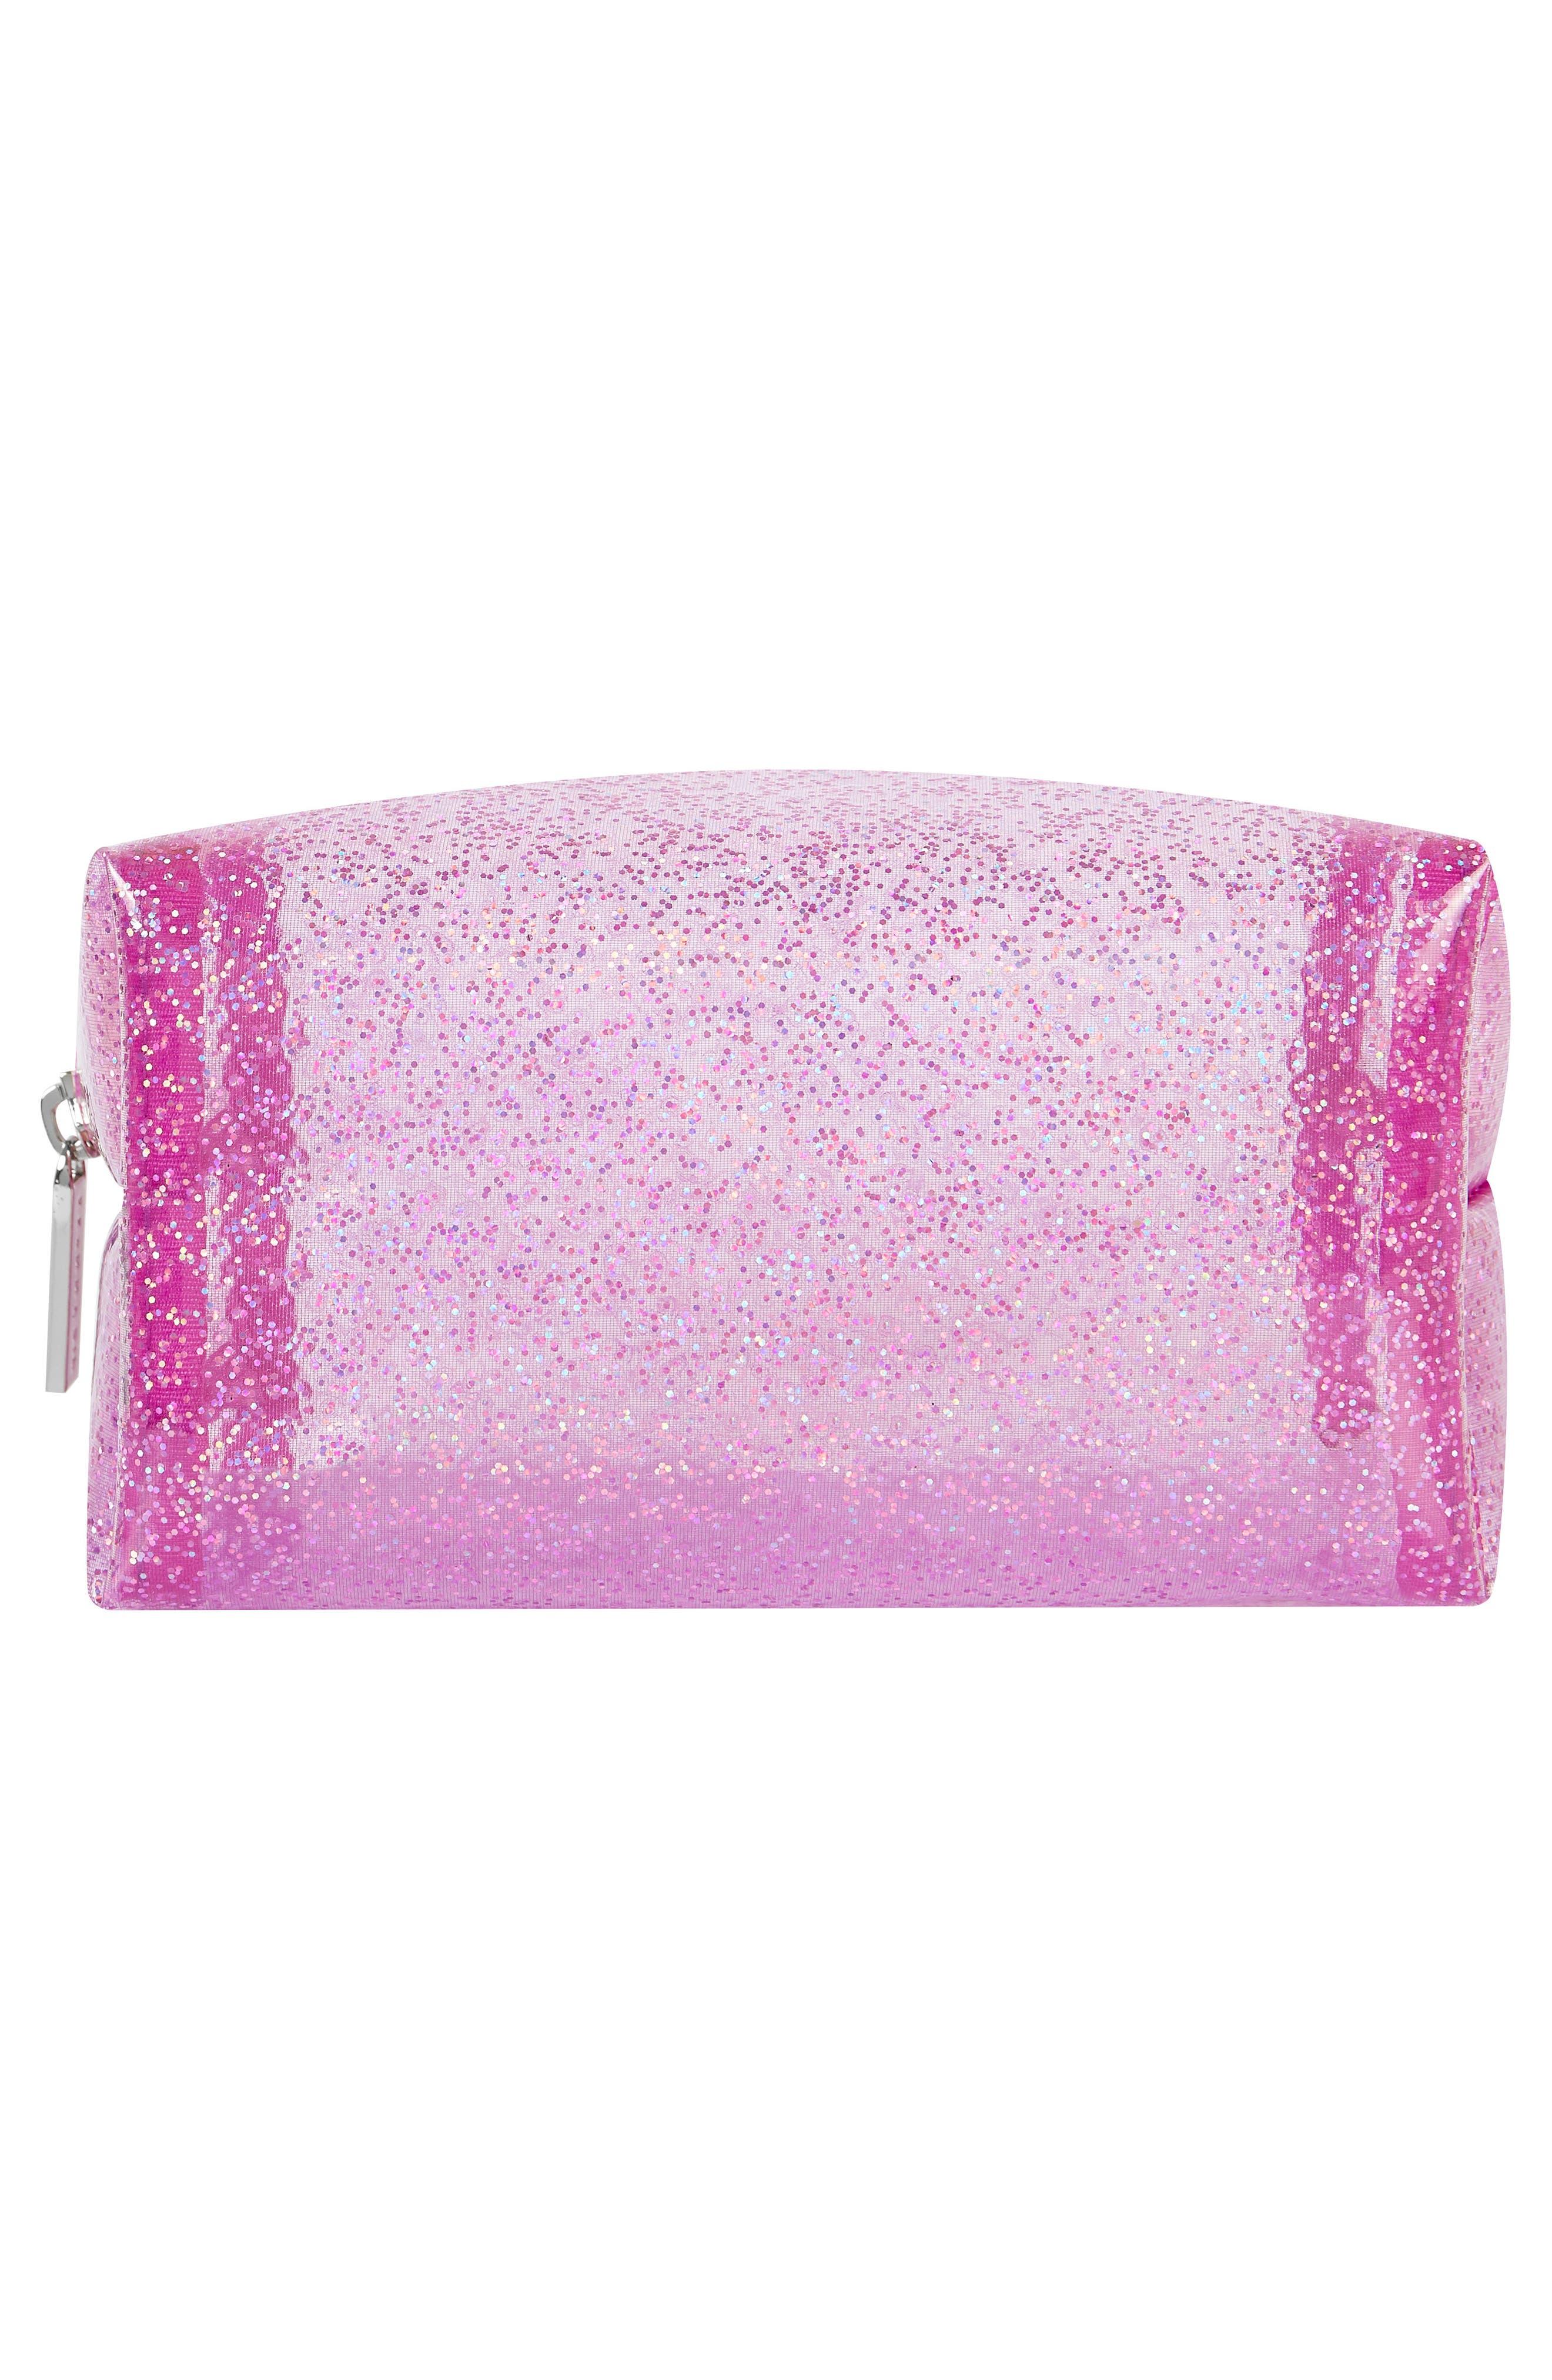 Skinny Dip Glitter Bomb Makeup Bag,                             Alternate thumbnail 3, color,                             No Color